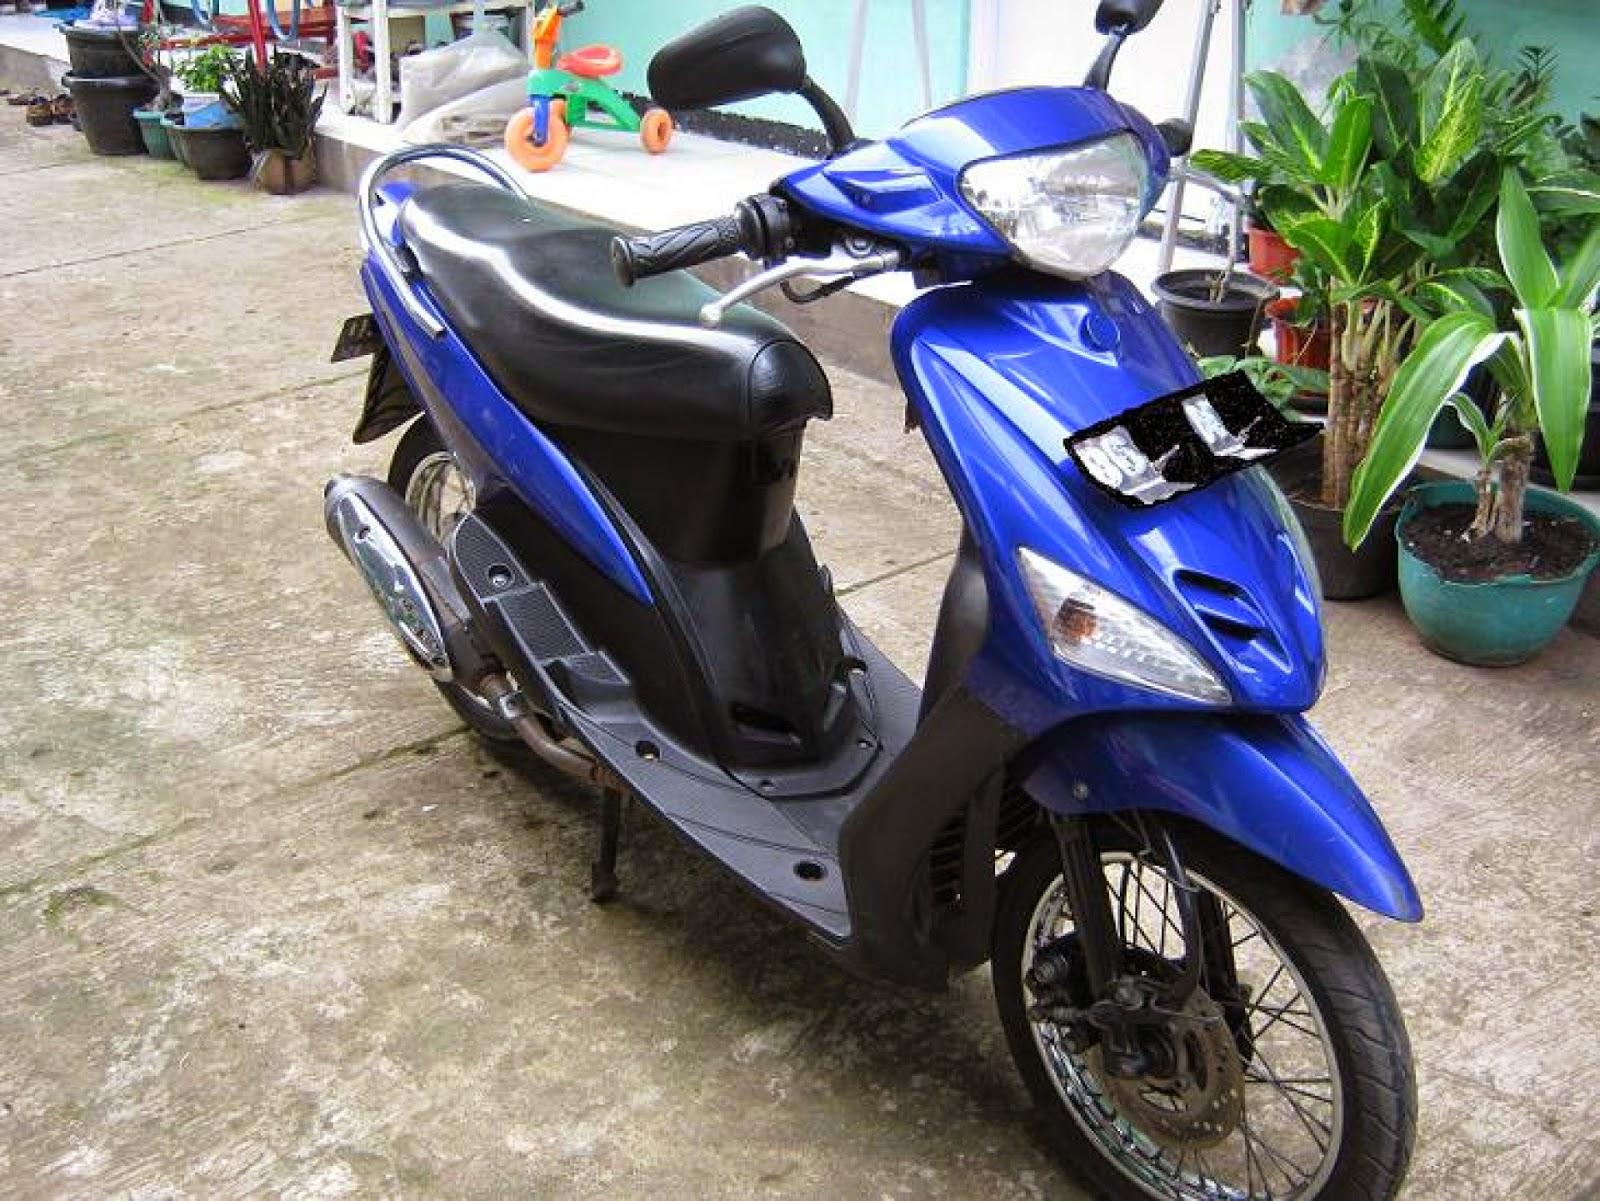 Harga Motor Bekas Yamaha   Daftar Harga Harga Motor Baru Bekas